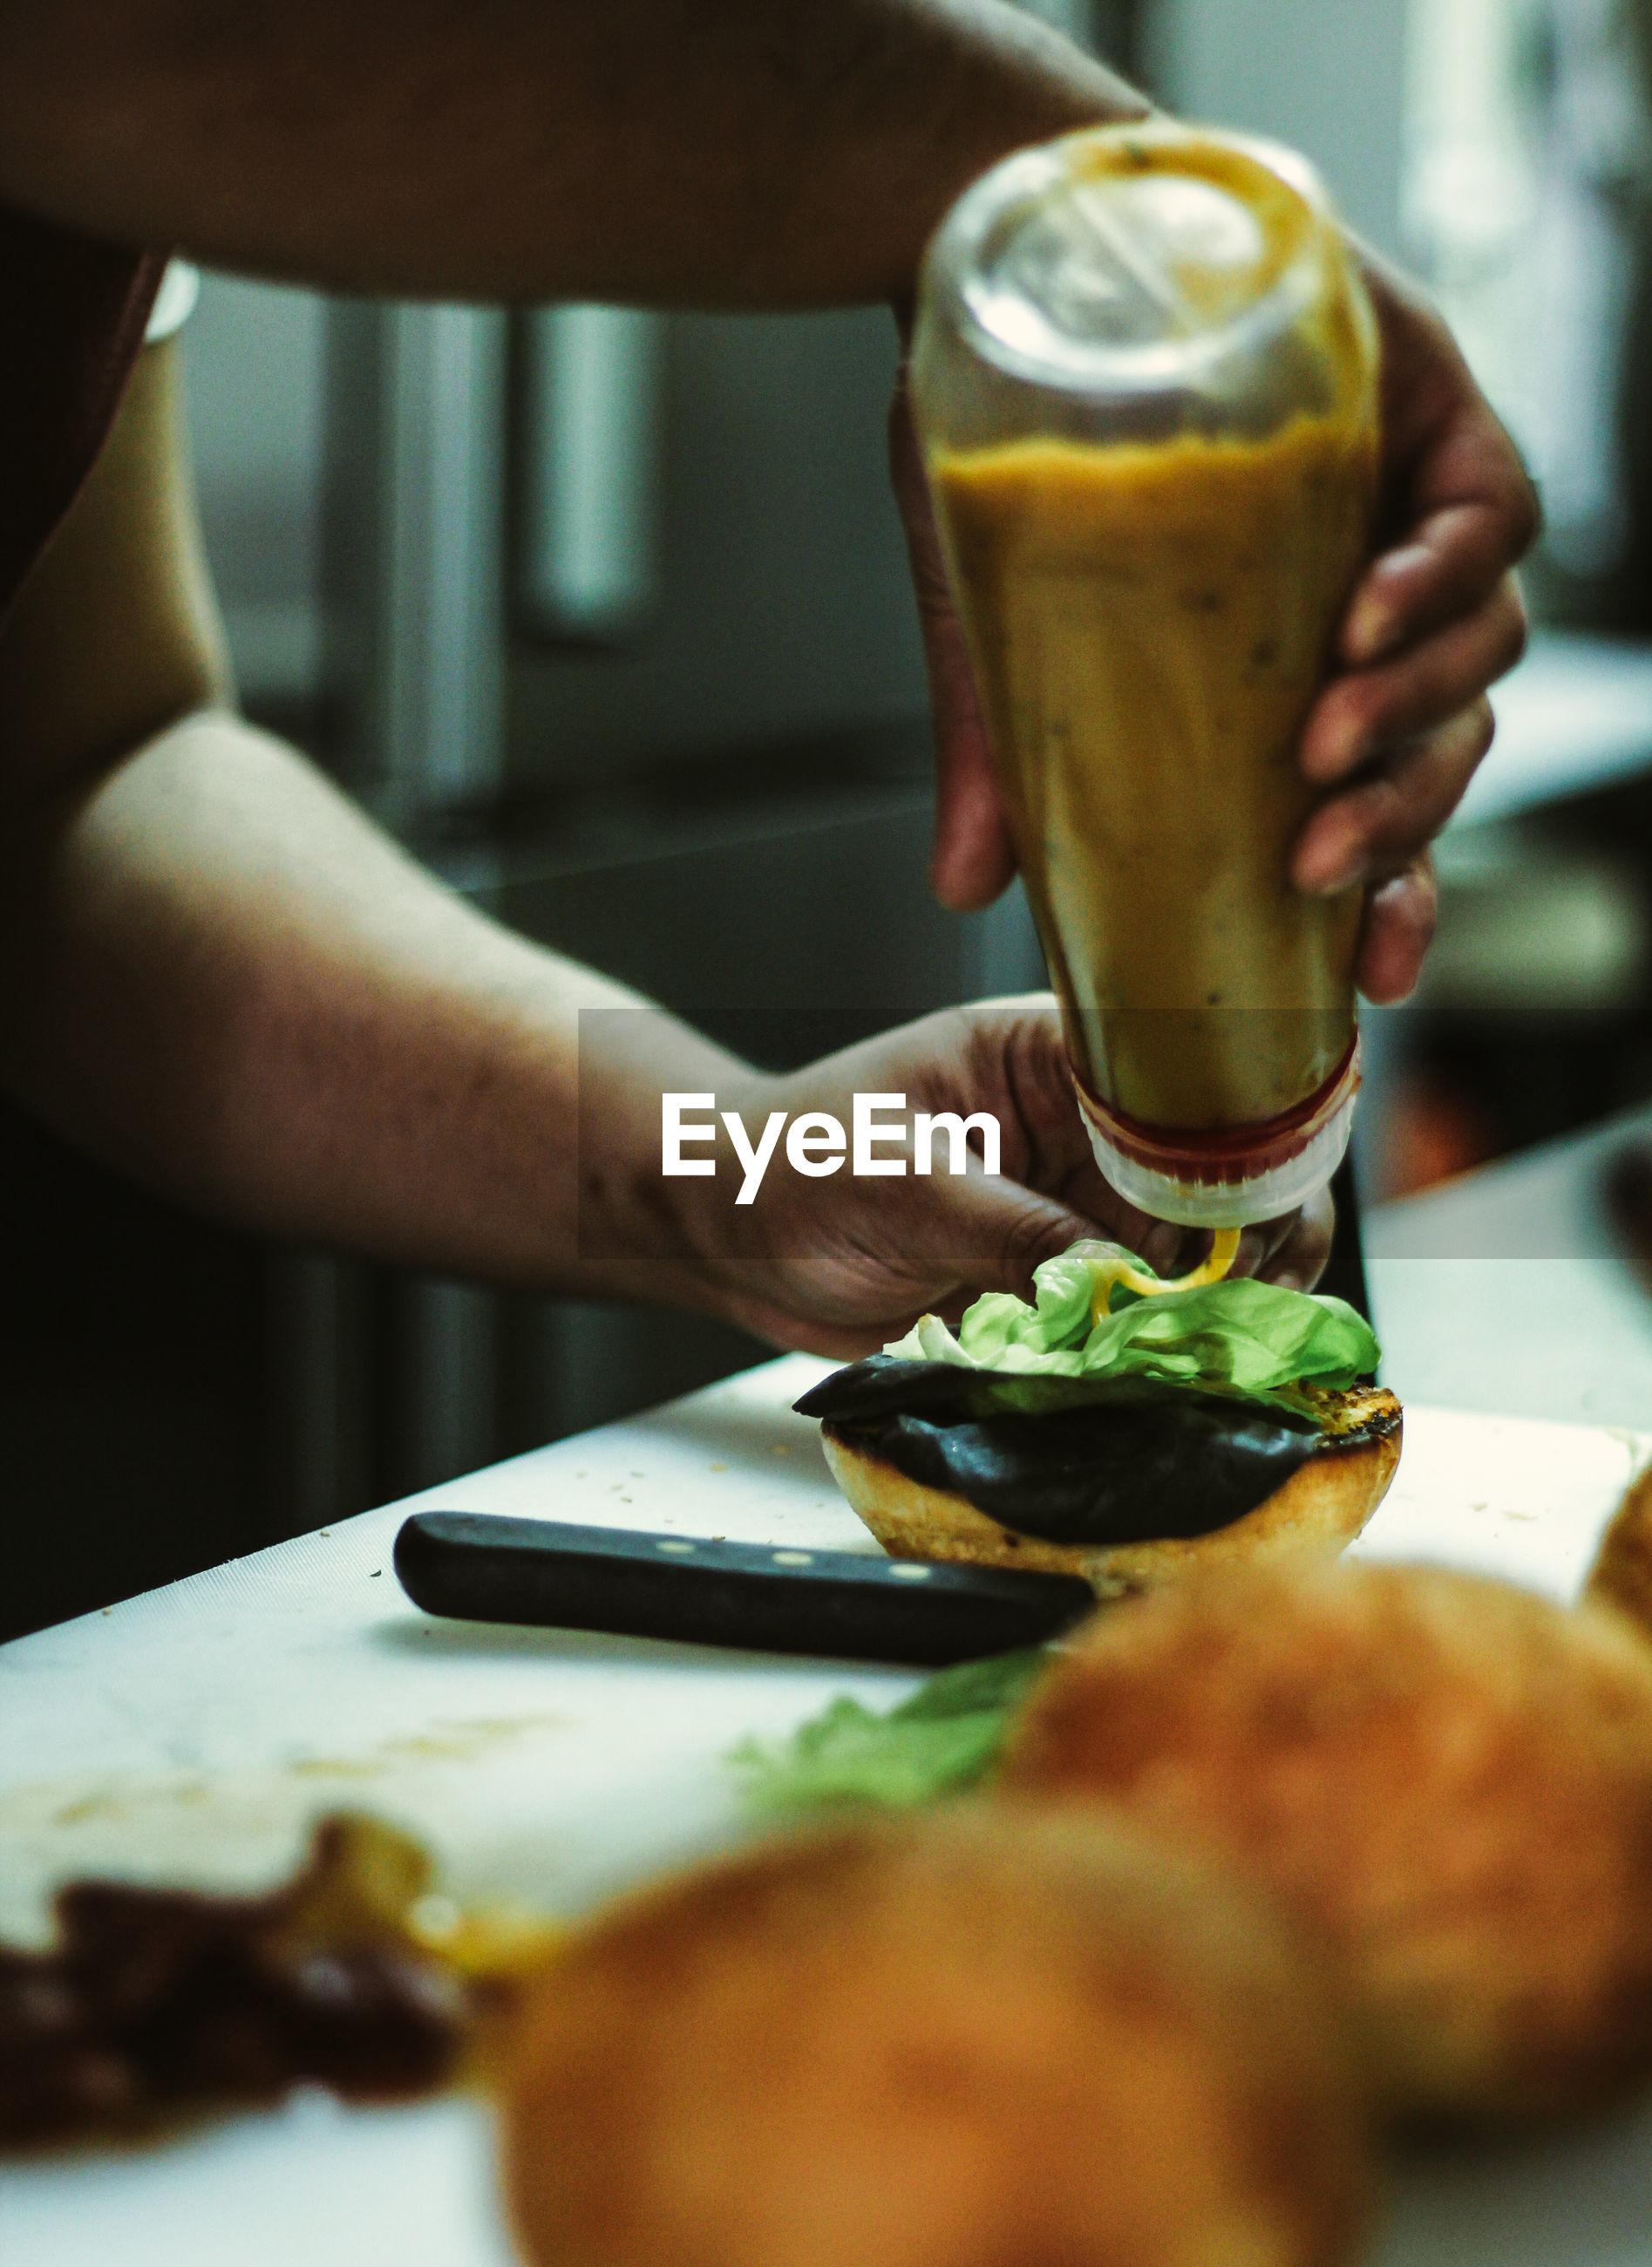 Close-up of hand preparing a burger